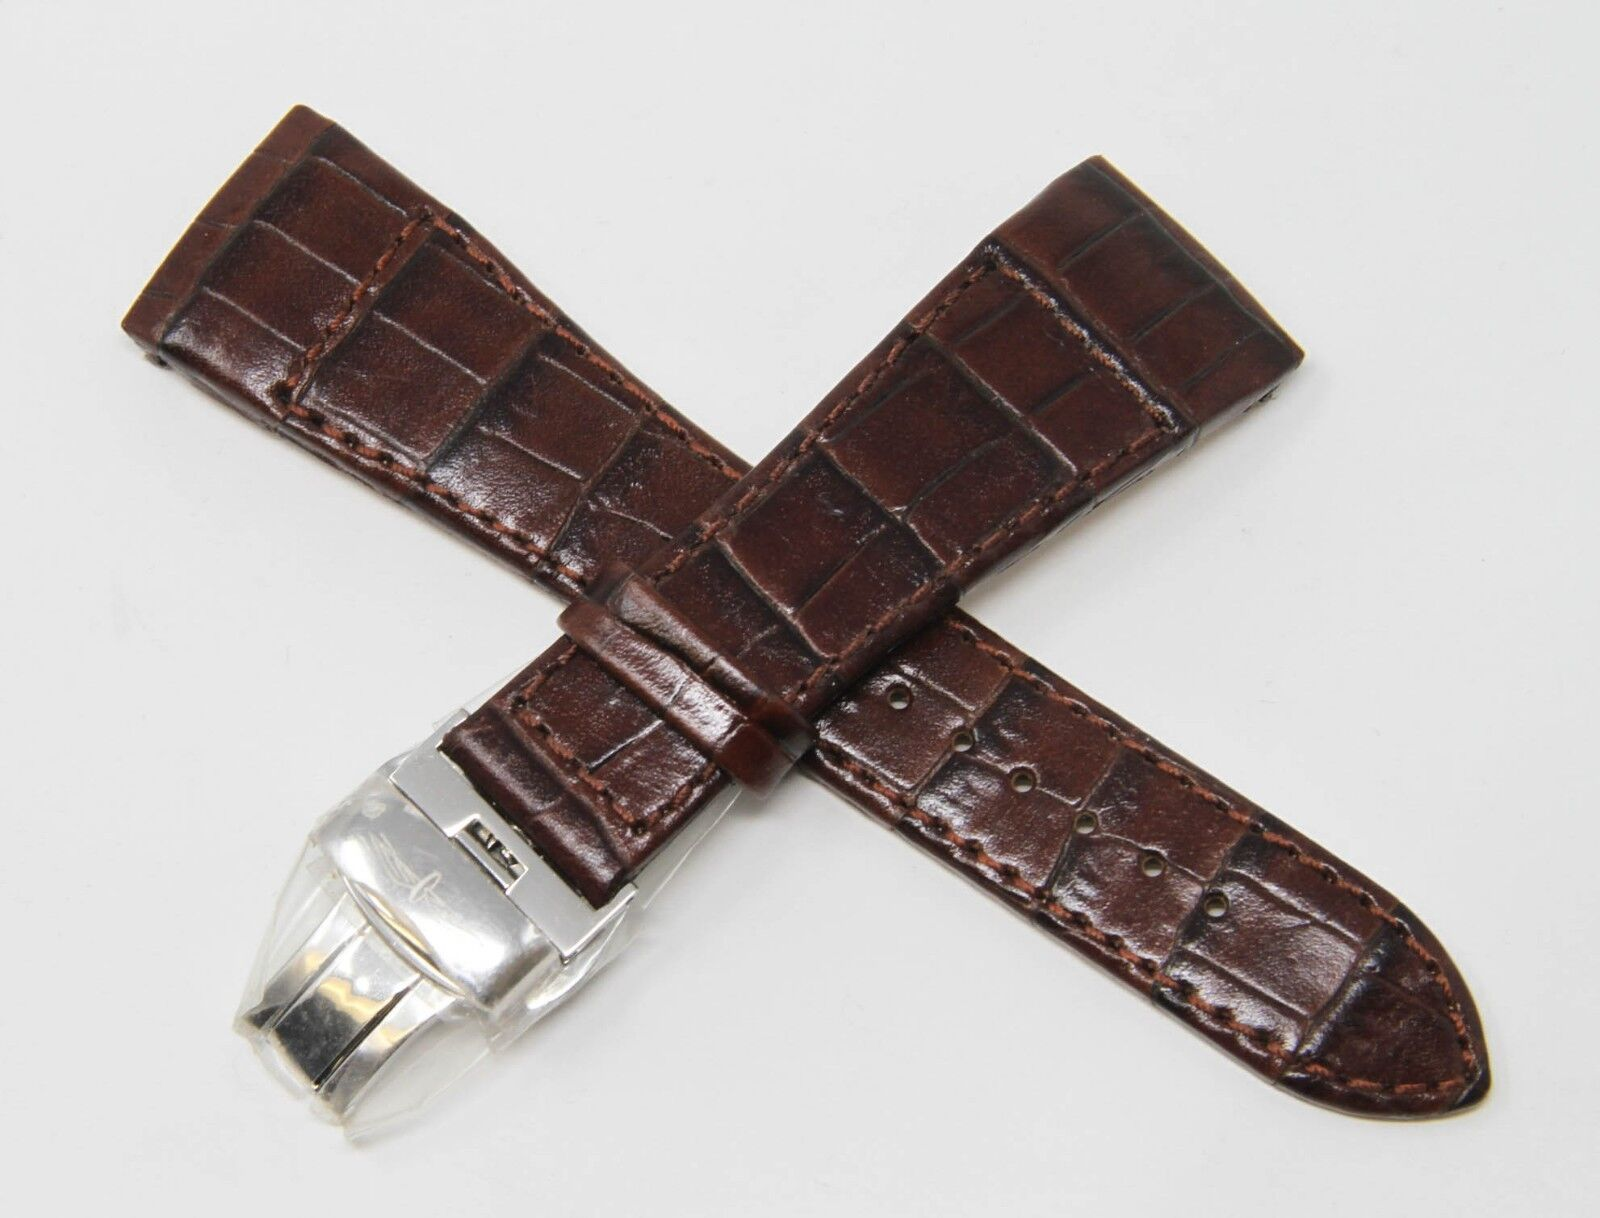 Rotary 24mm Alligator Prägung Uhrenarmband Braun mit Faltschliesse